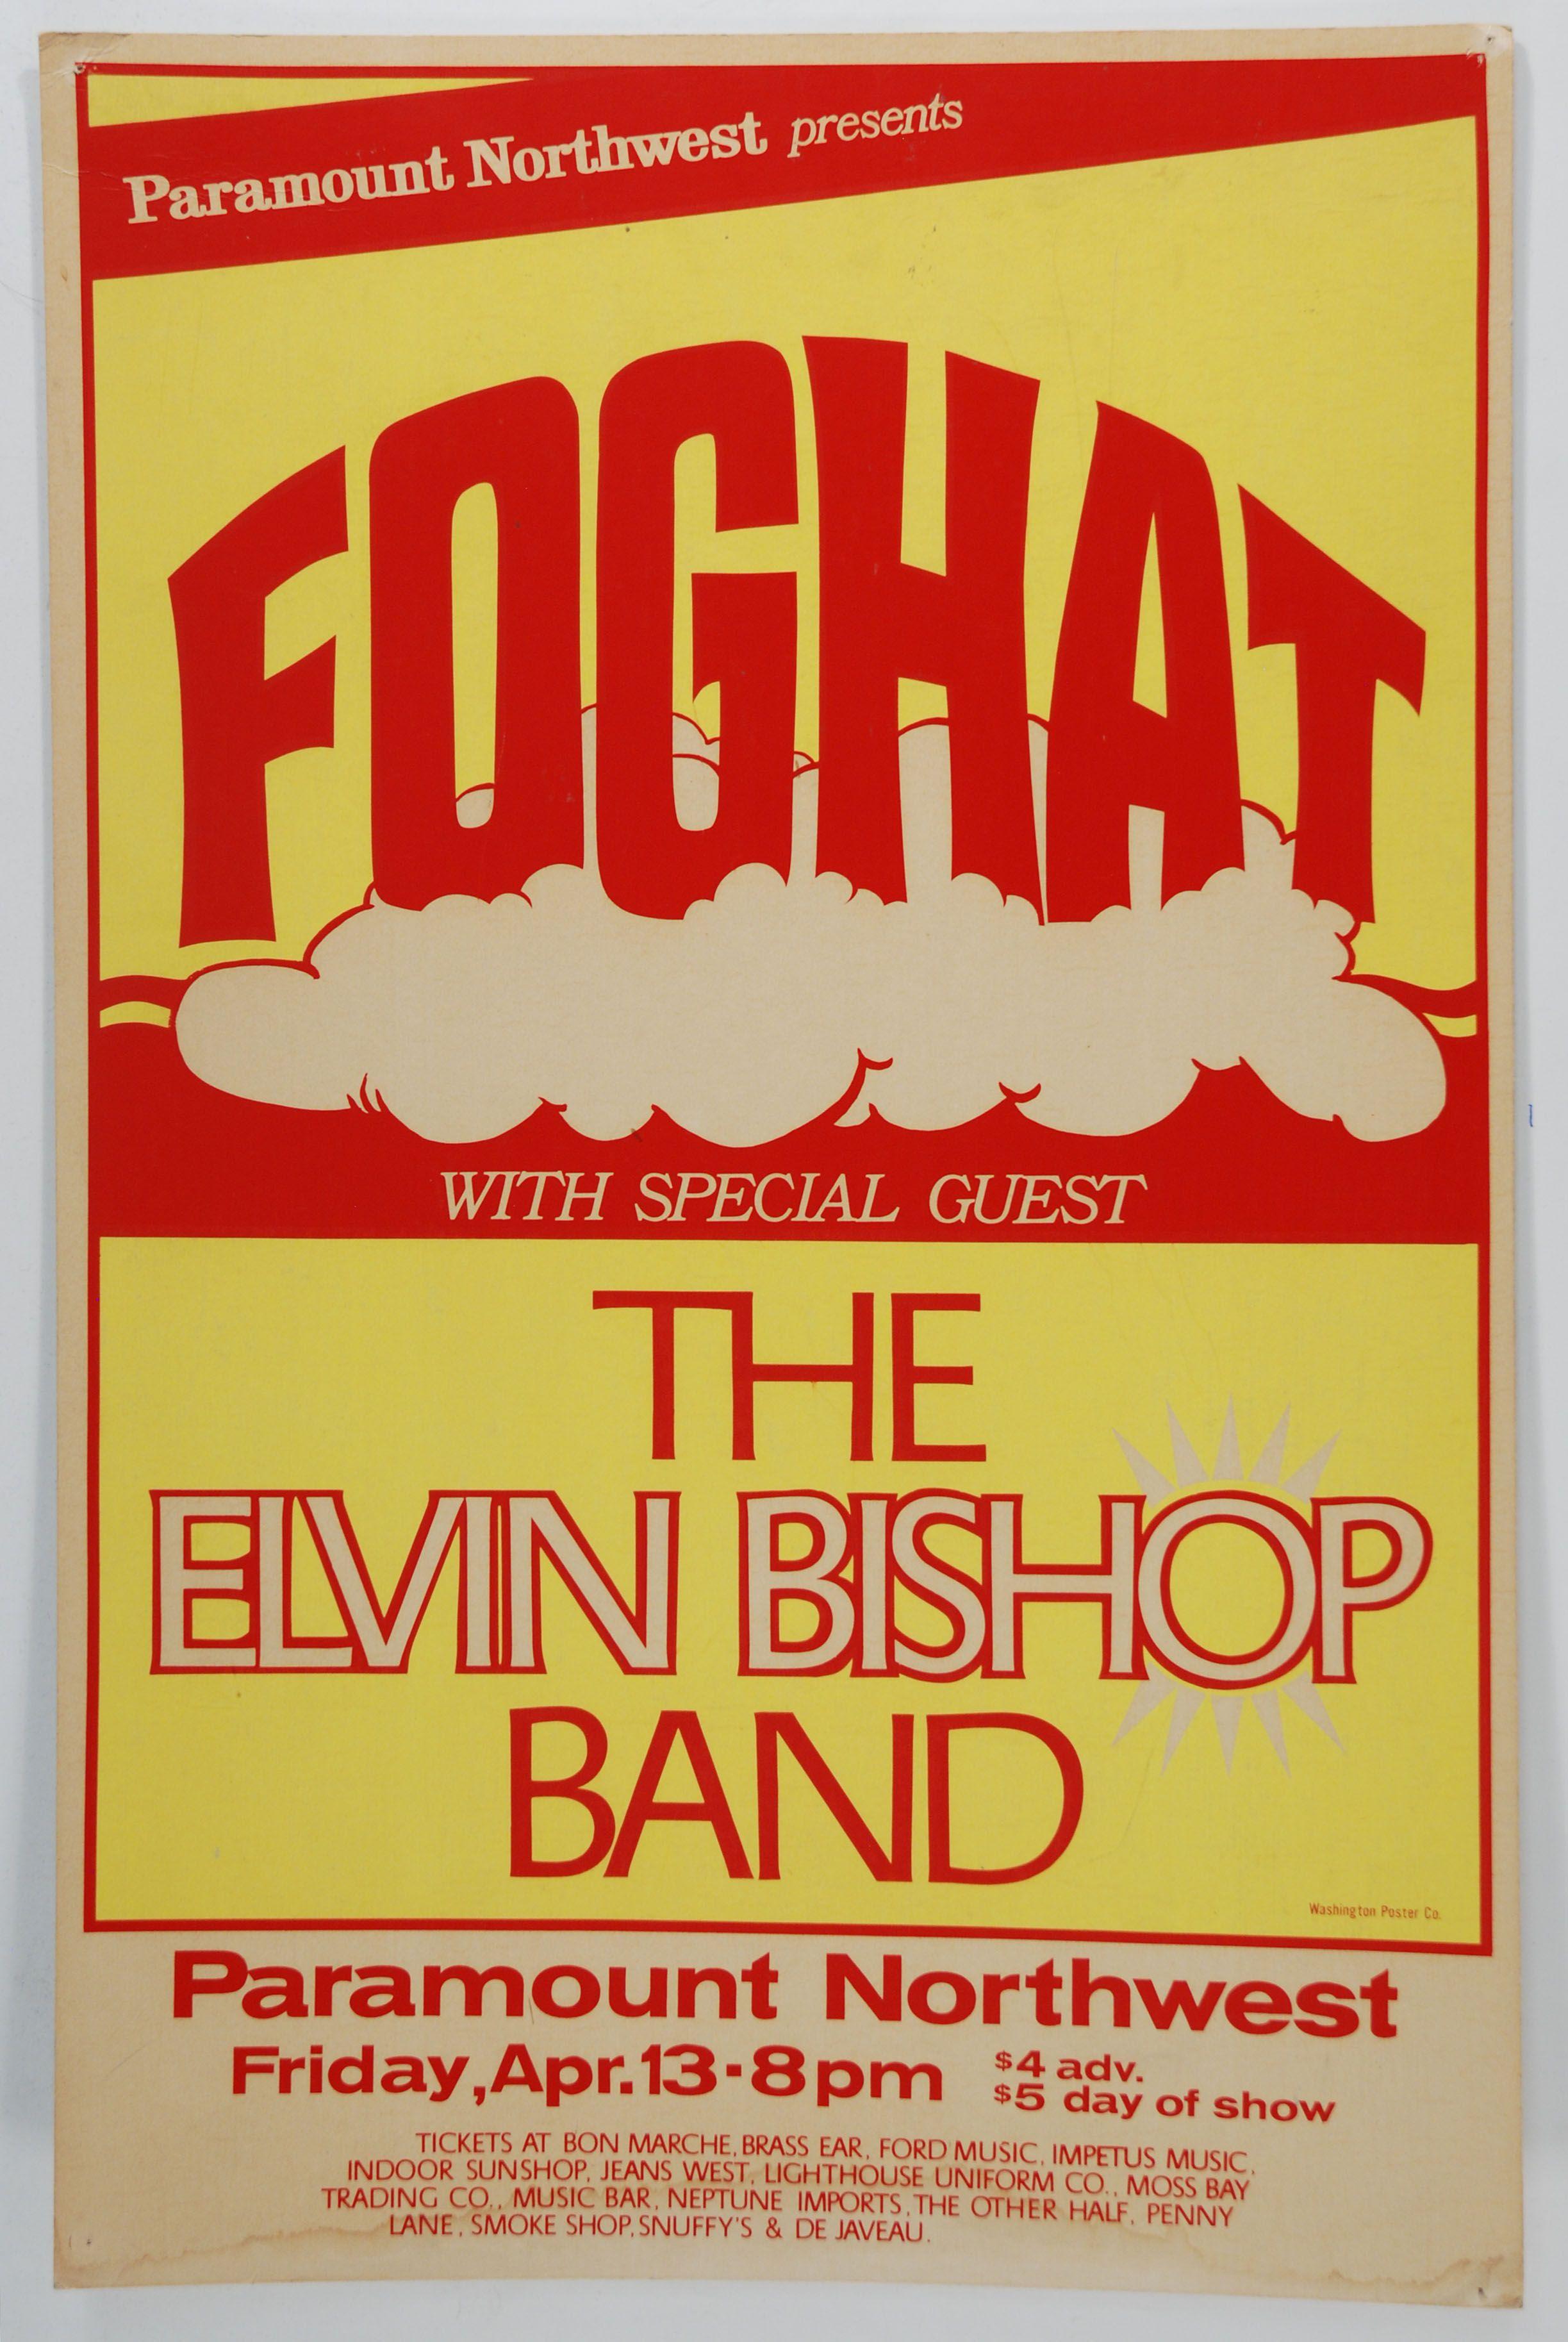 Concert Vintage Music Posters